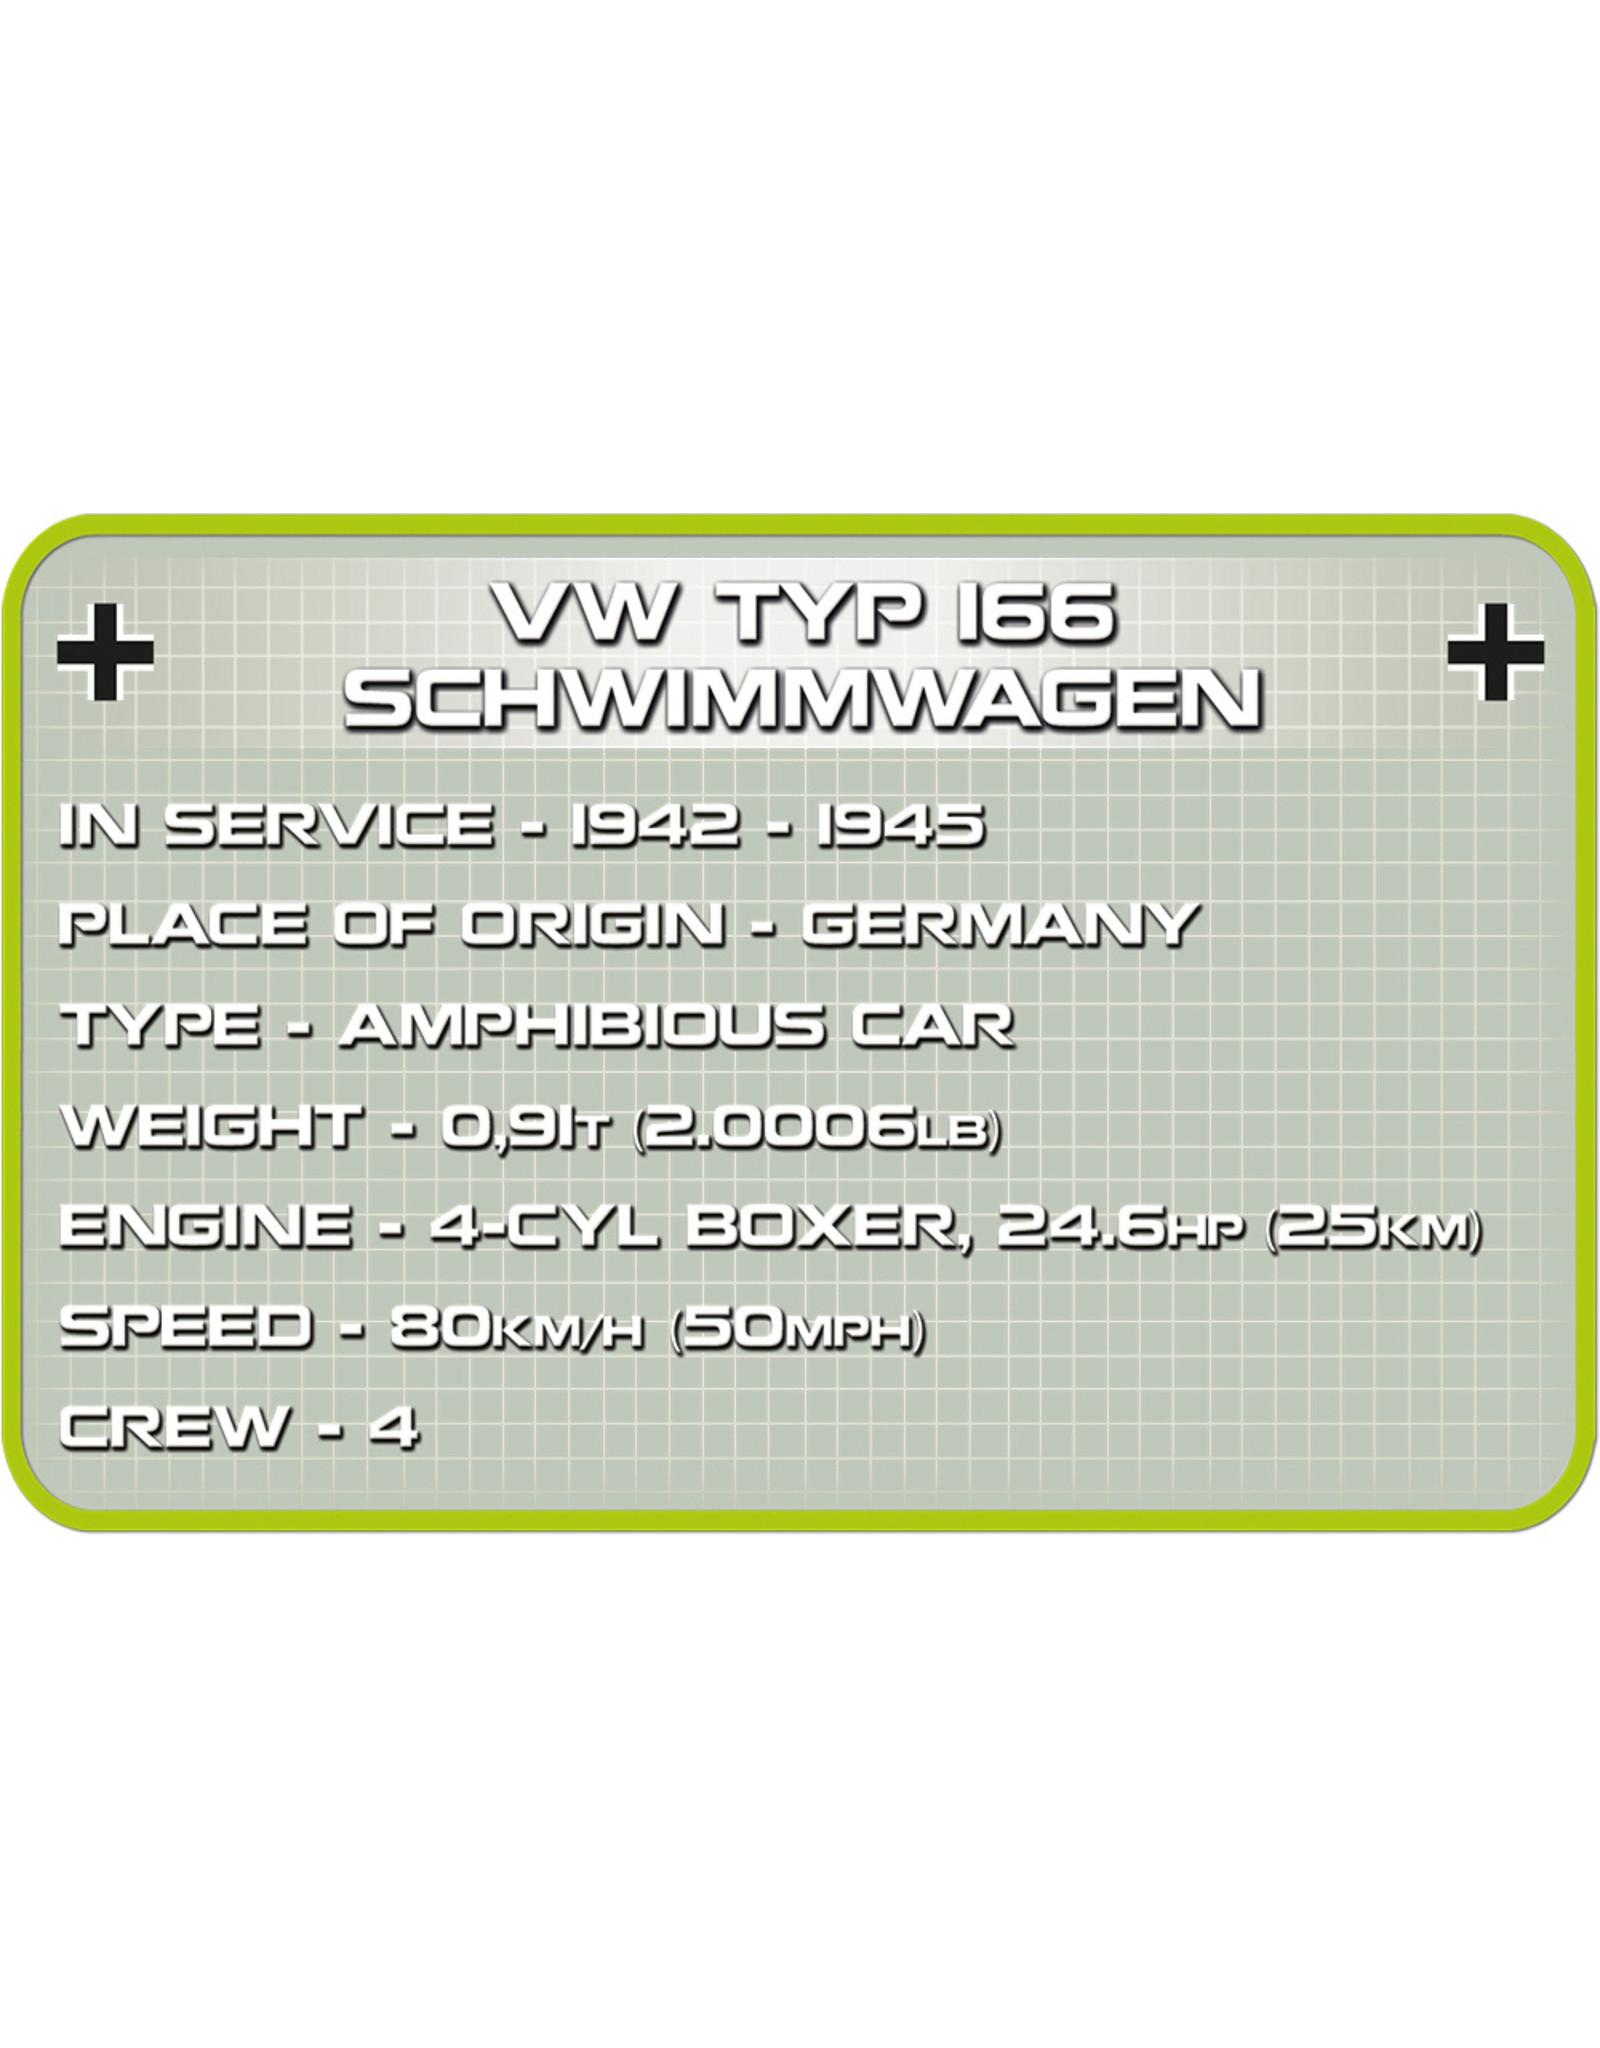 COBI COBI  2403 VW Typ 166 Schwimmwagen